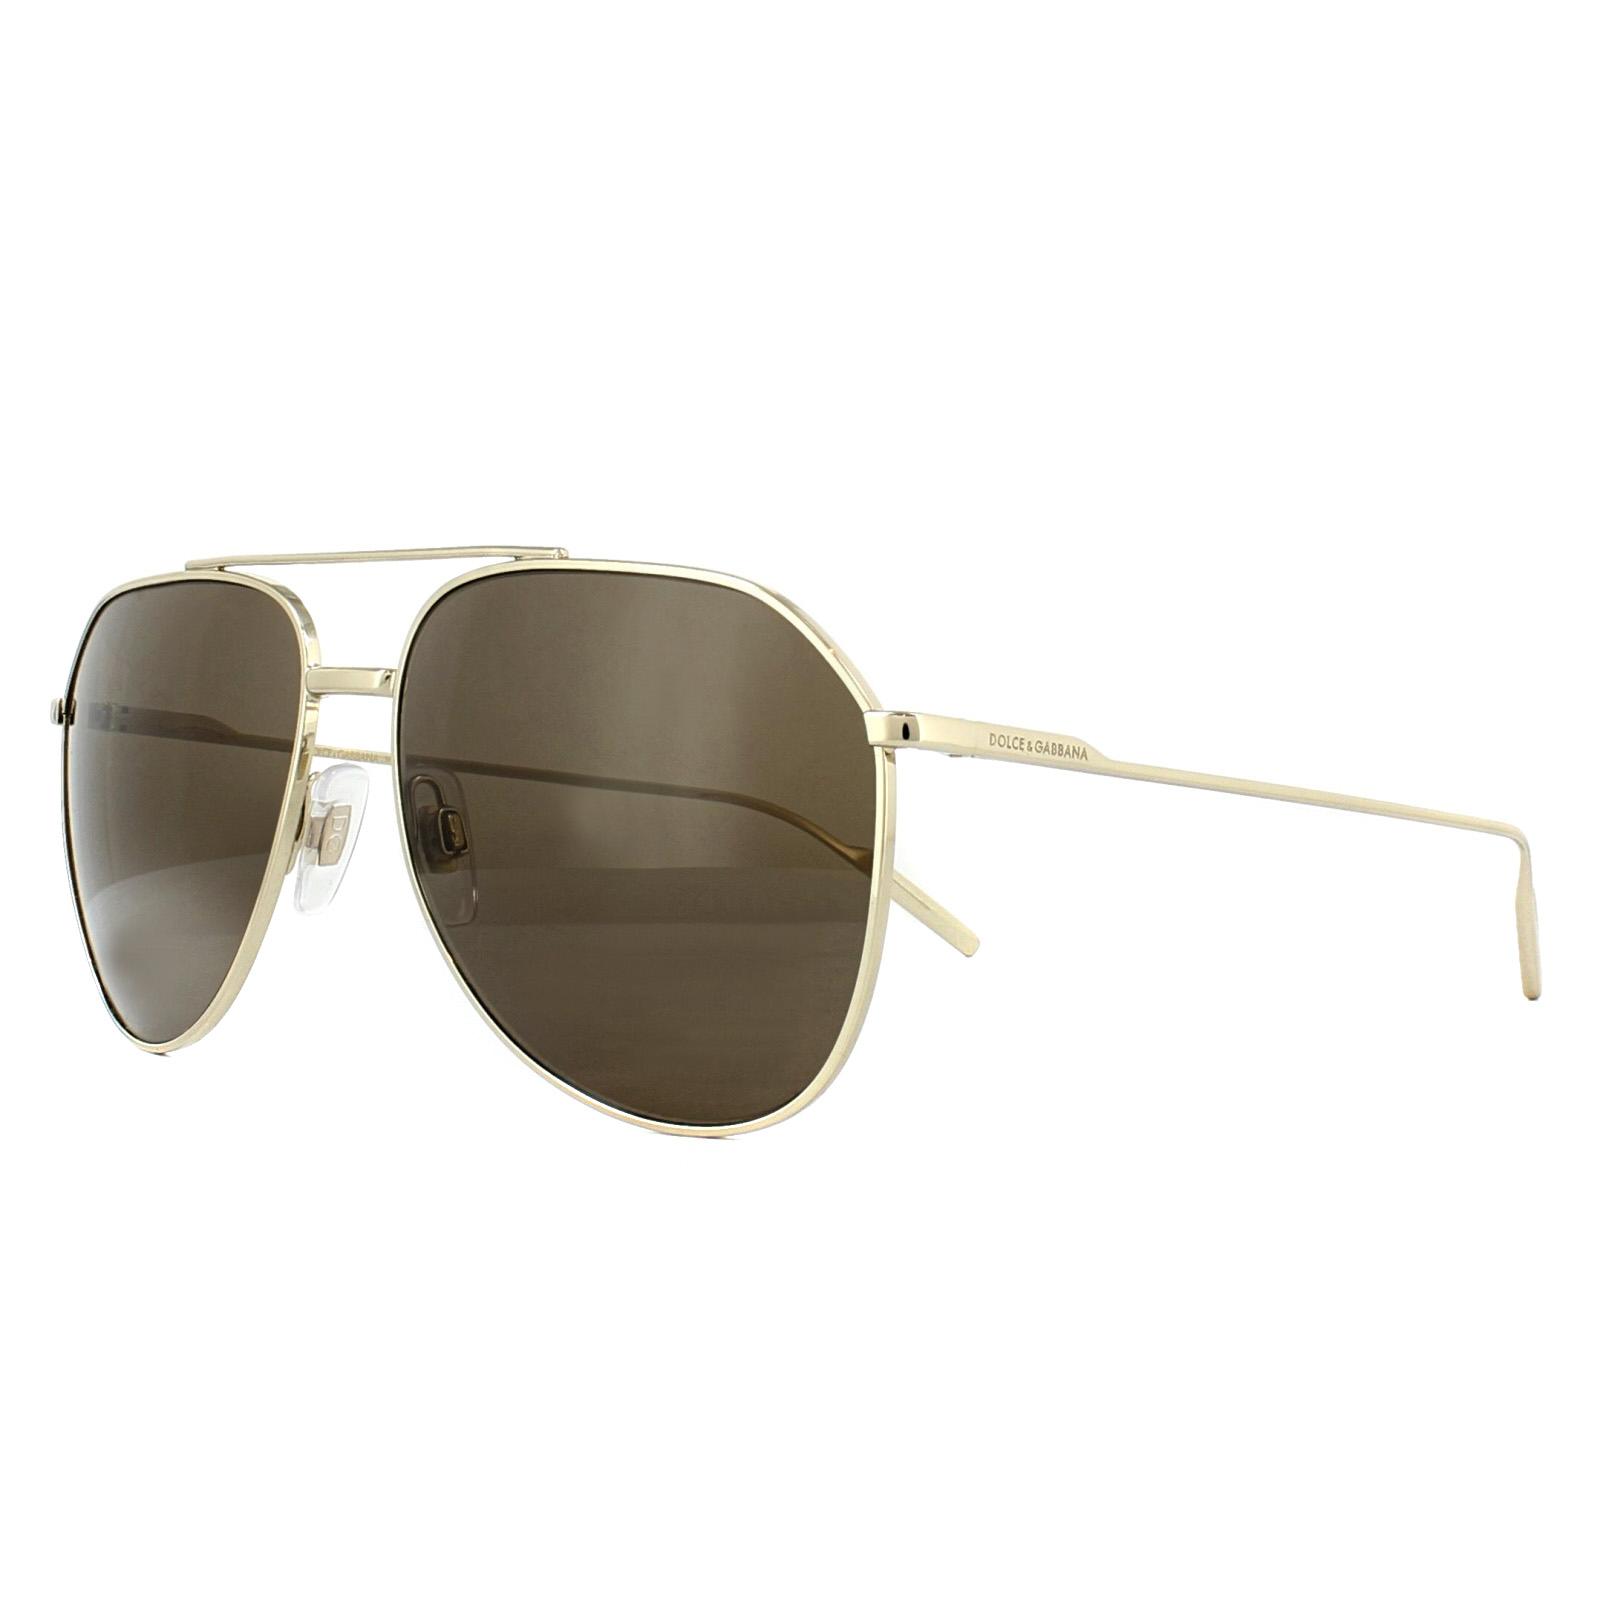 24631b63999 Sentinel Dolce   Gabbana Sunglasses DG2166 488 73 Pale Gold Brown